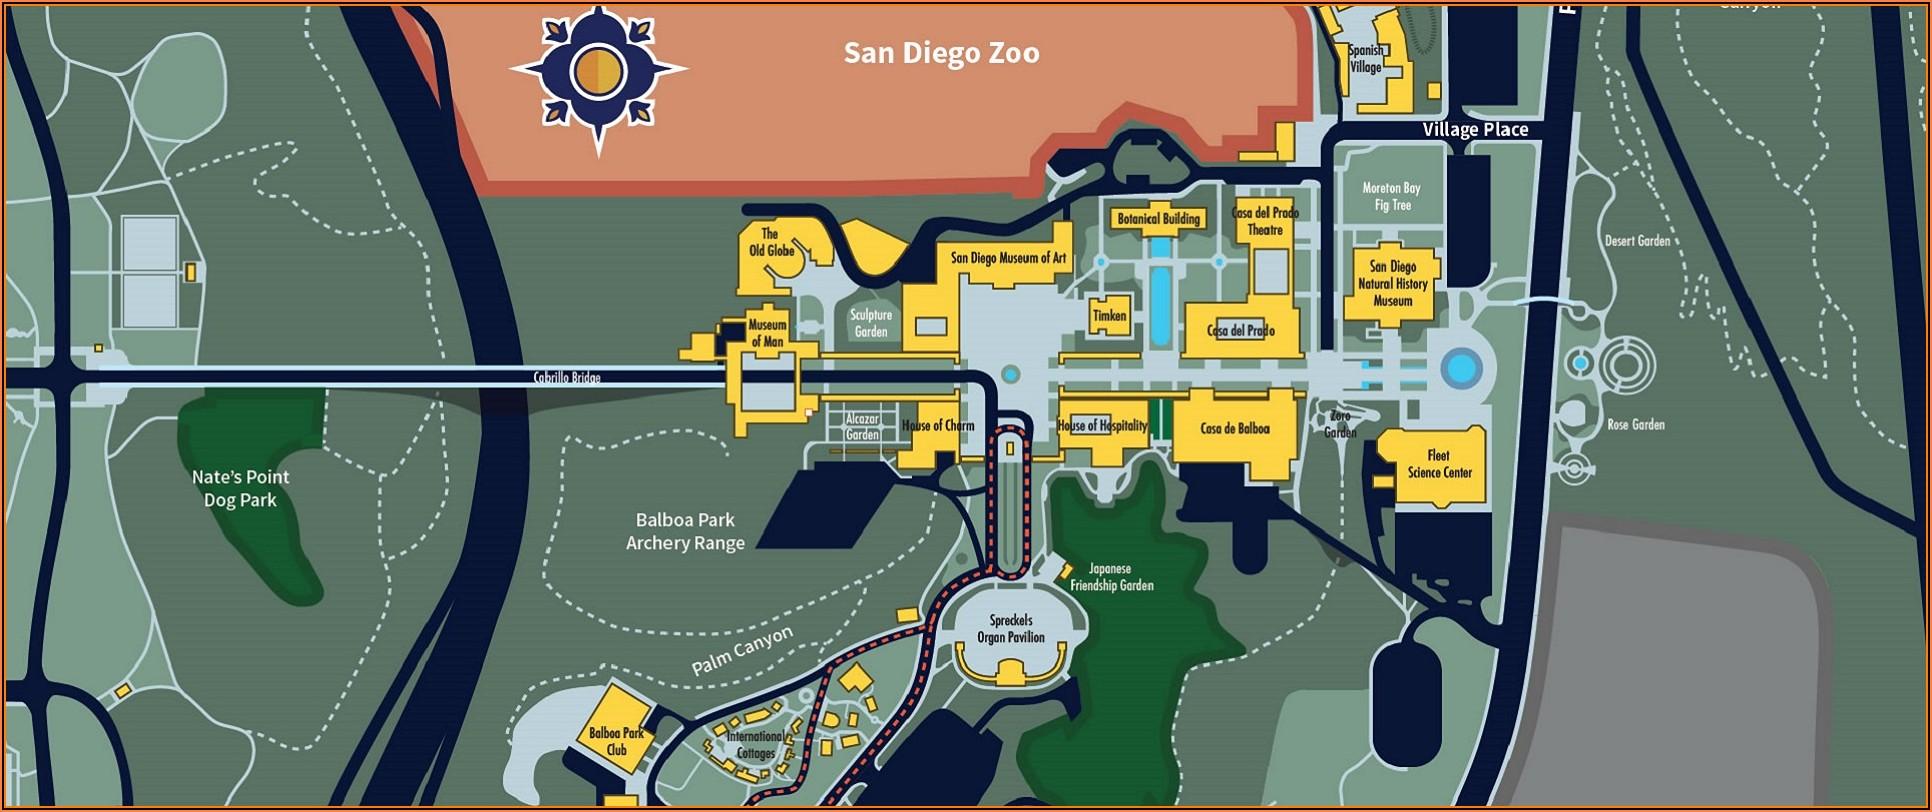 Google Maps Hotel Circle San Diego